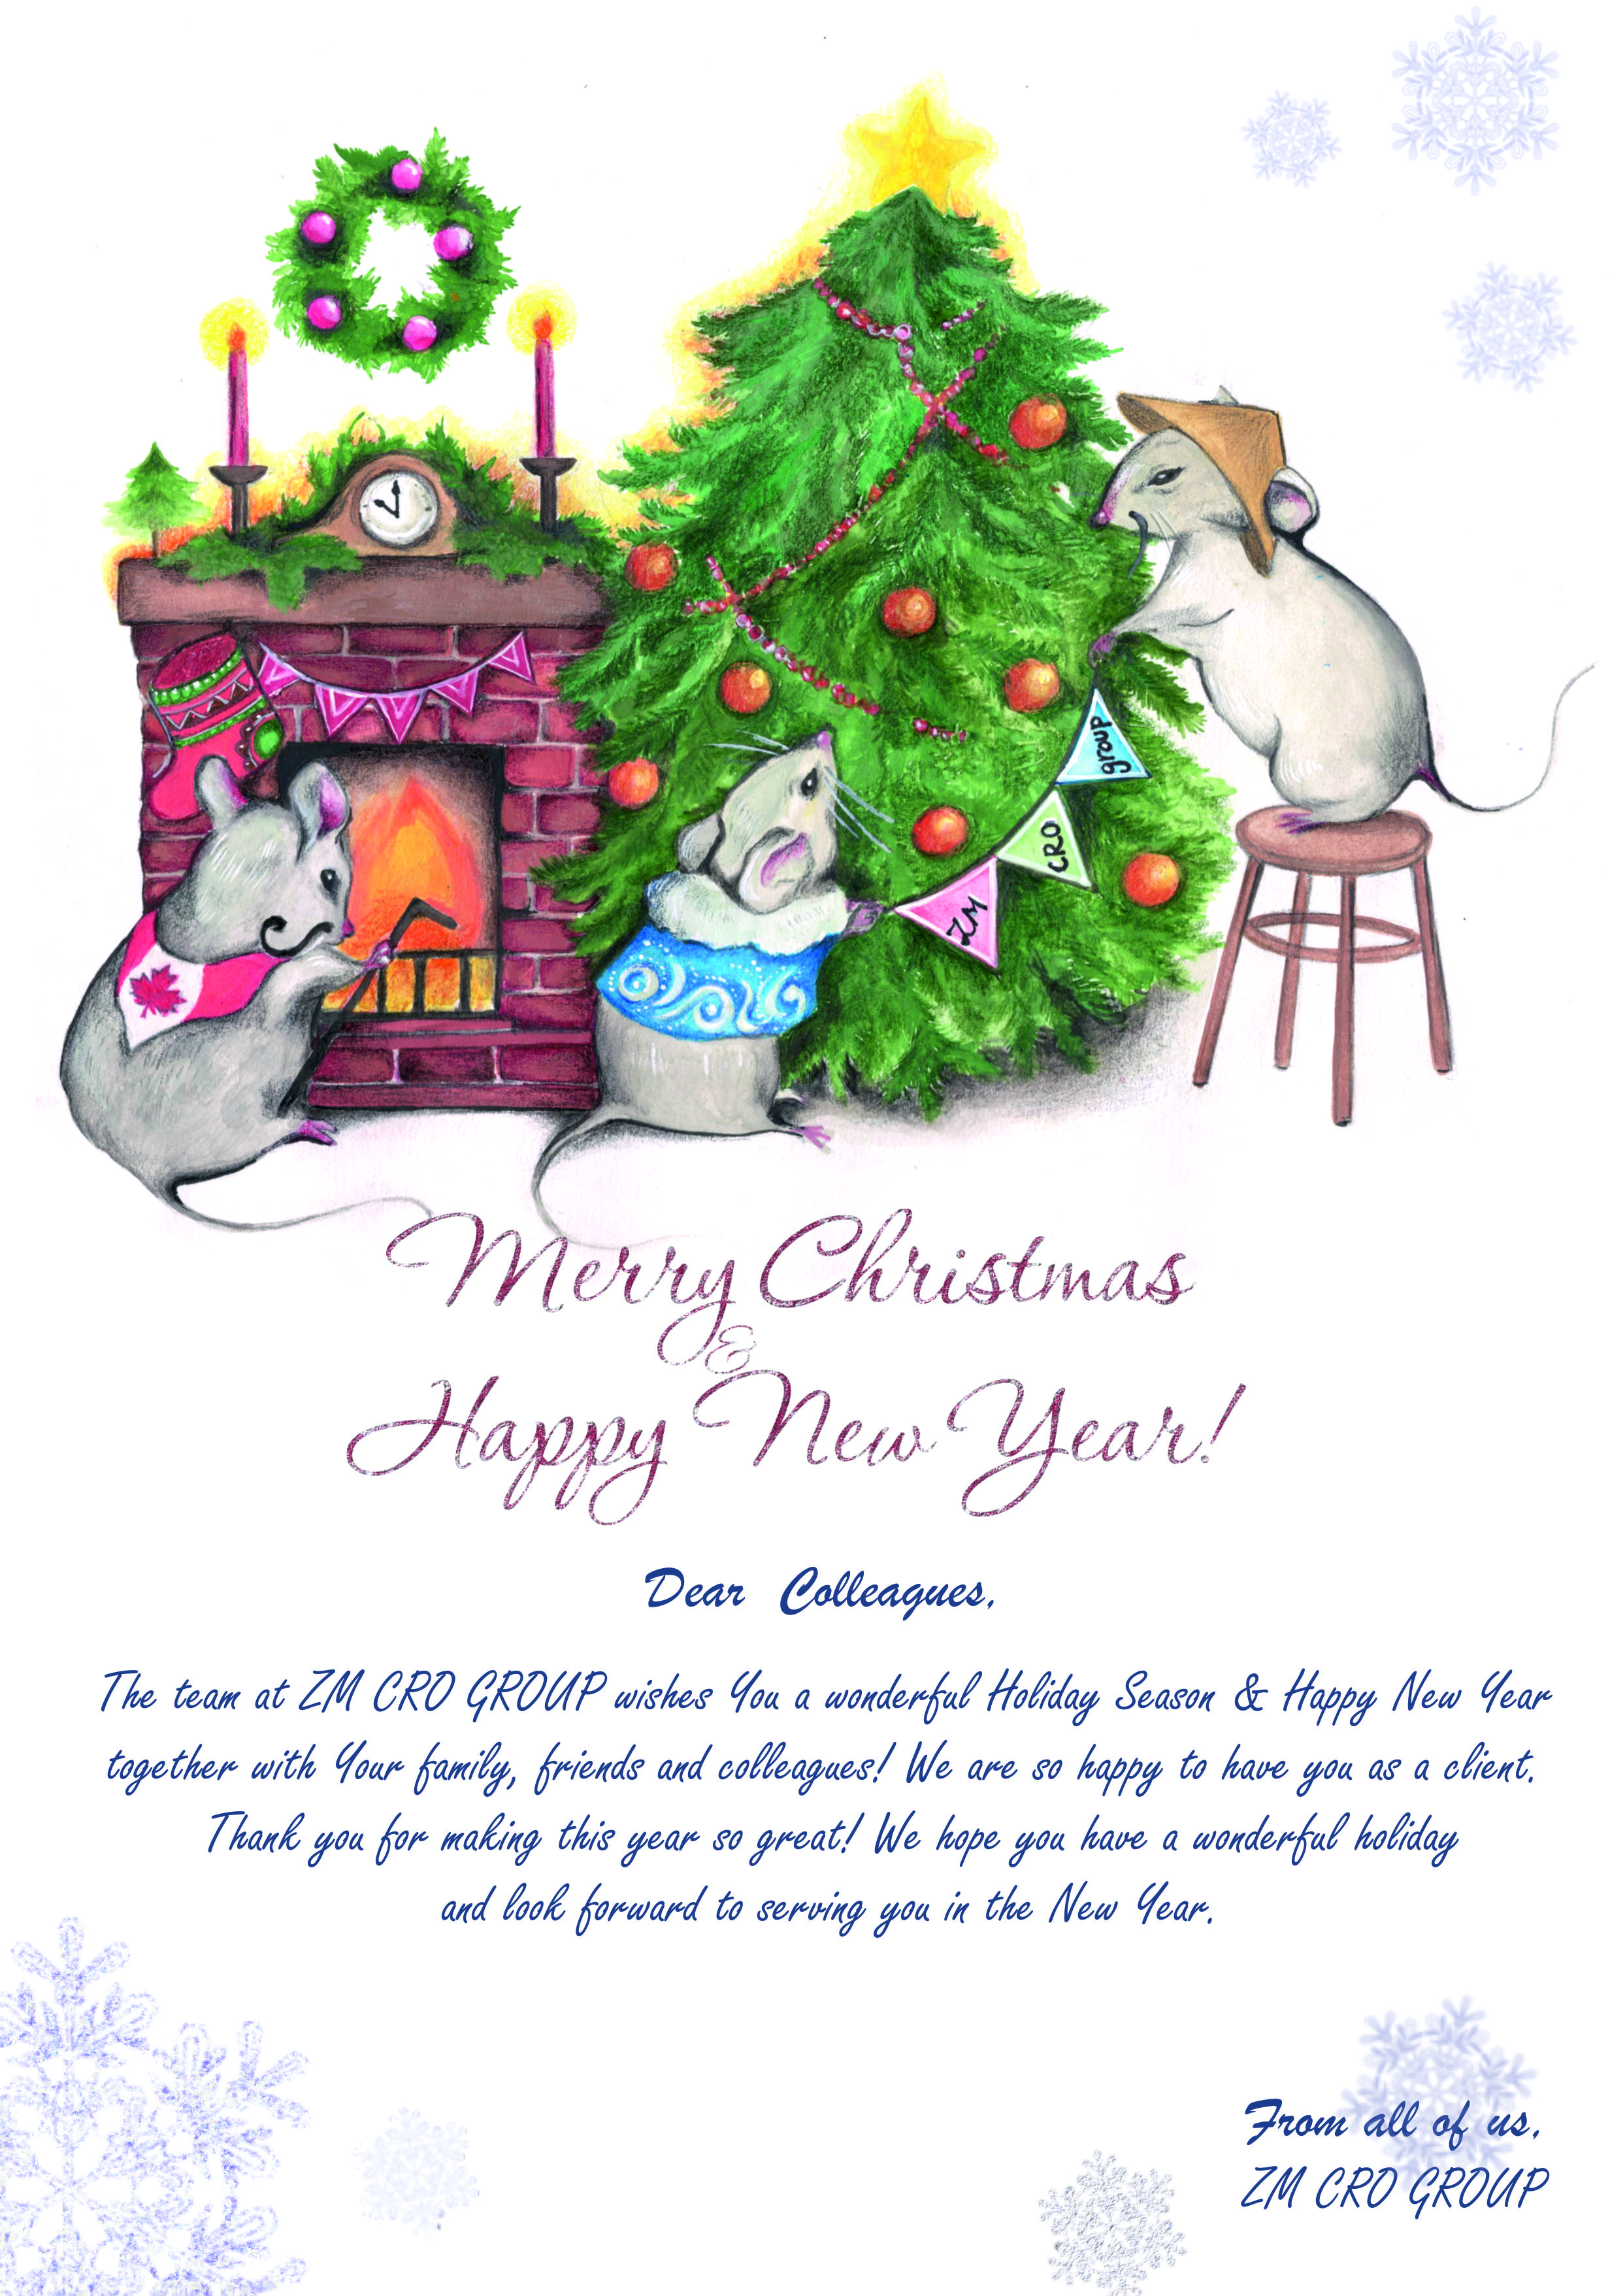 Happy New Year 2020_ZM CRO GROUP